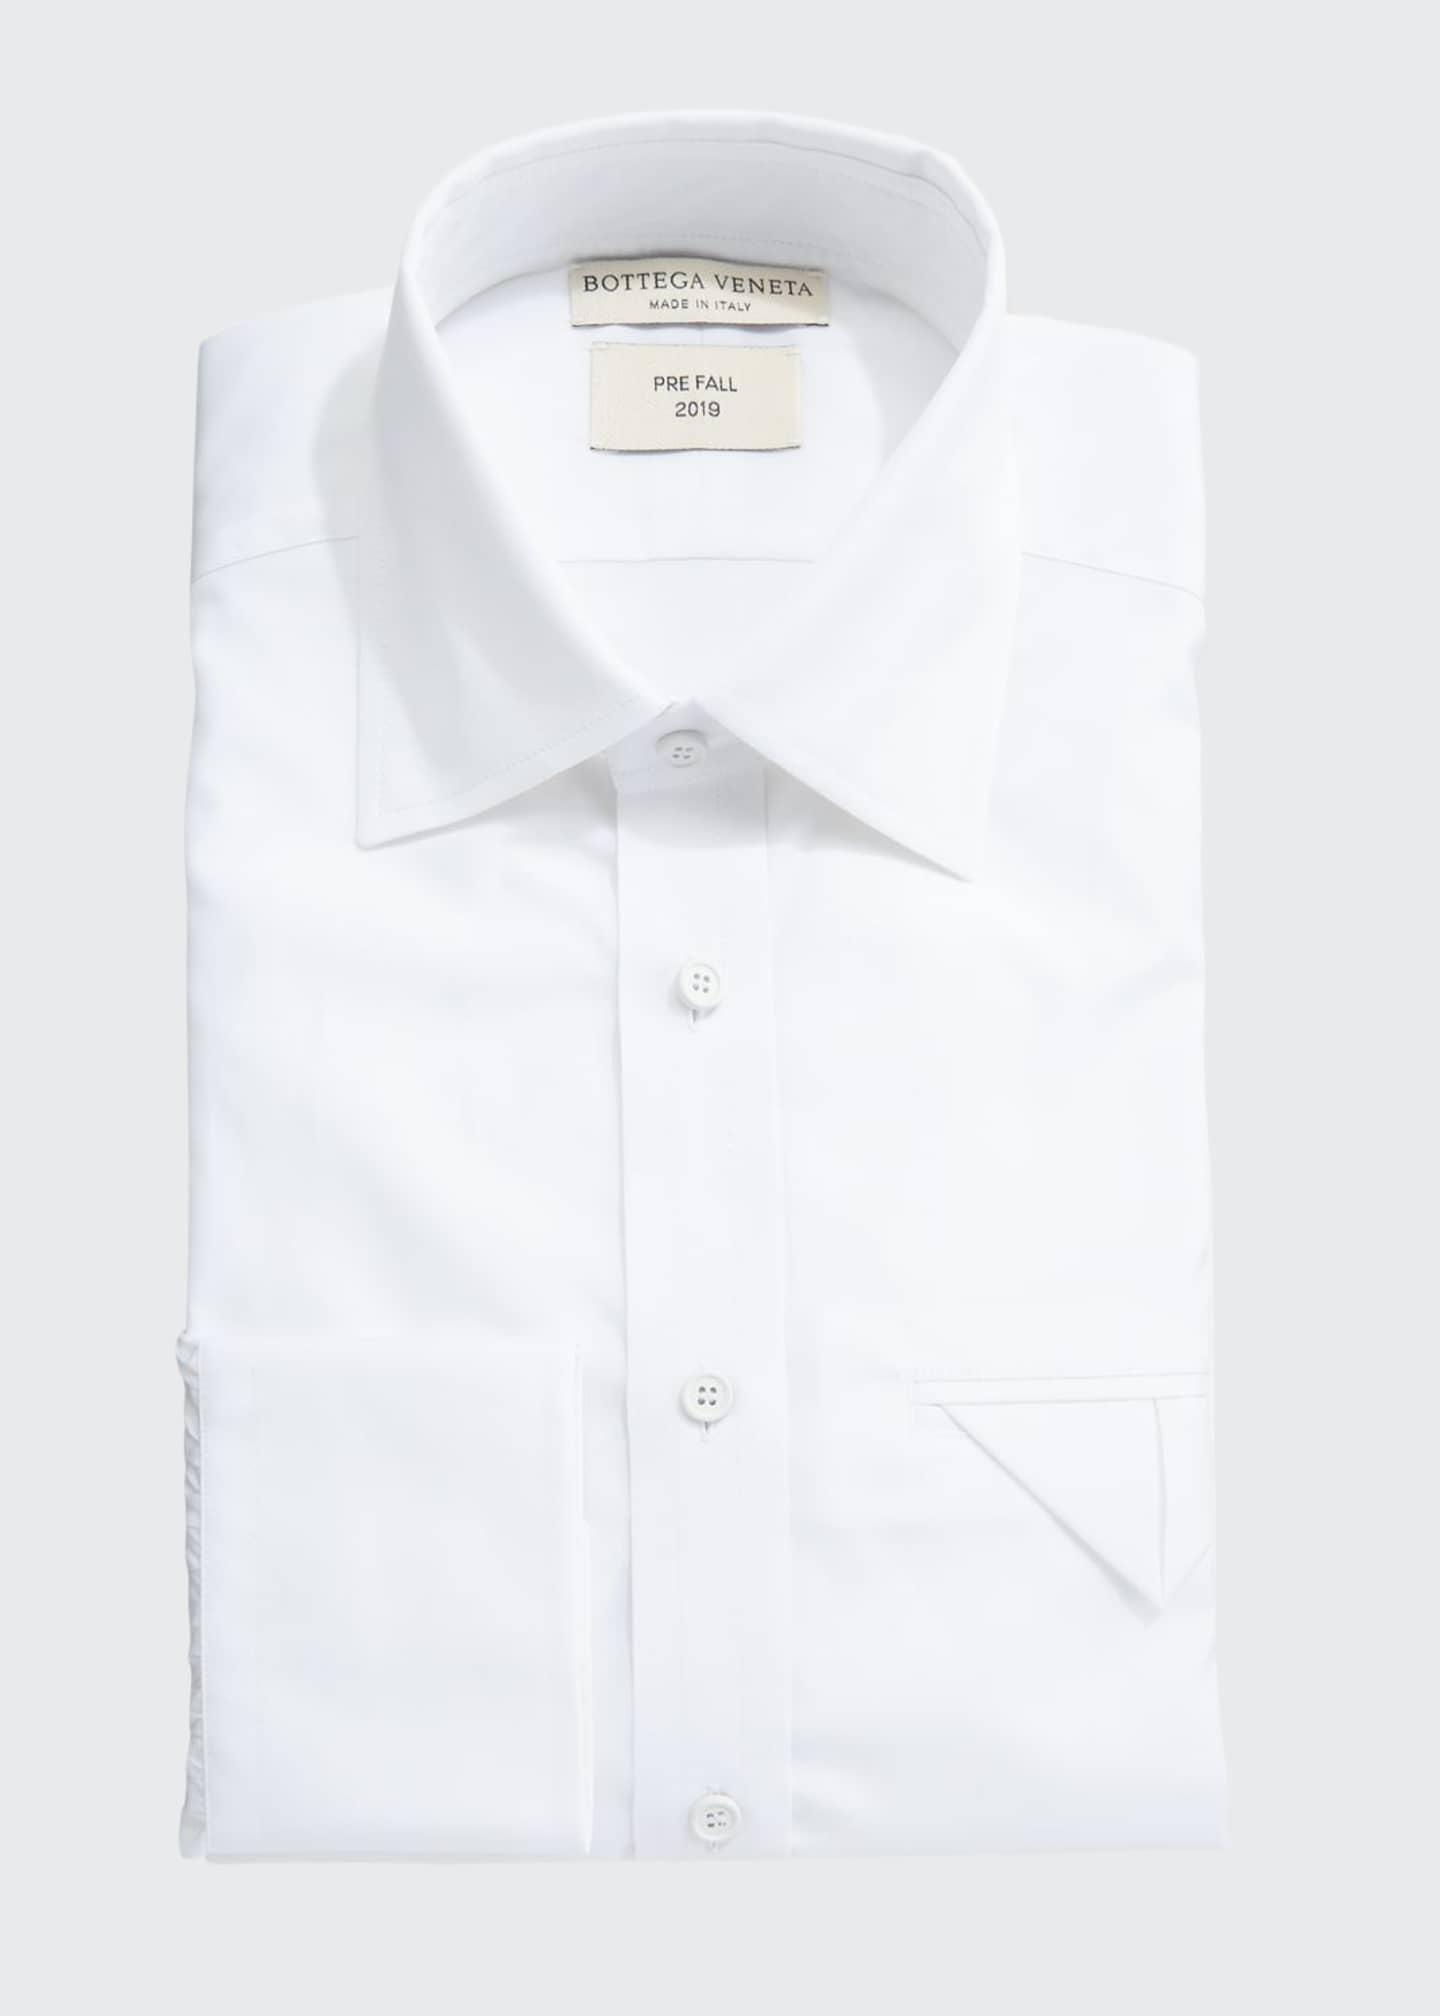 Bottega Veneta Men's Poplin Egyptian Cotton Dress Shirt